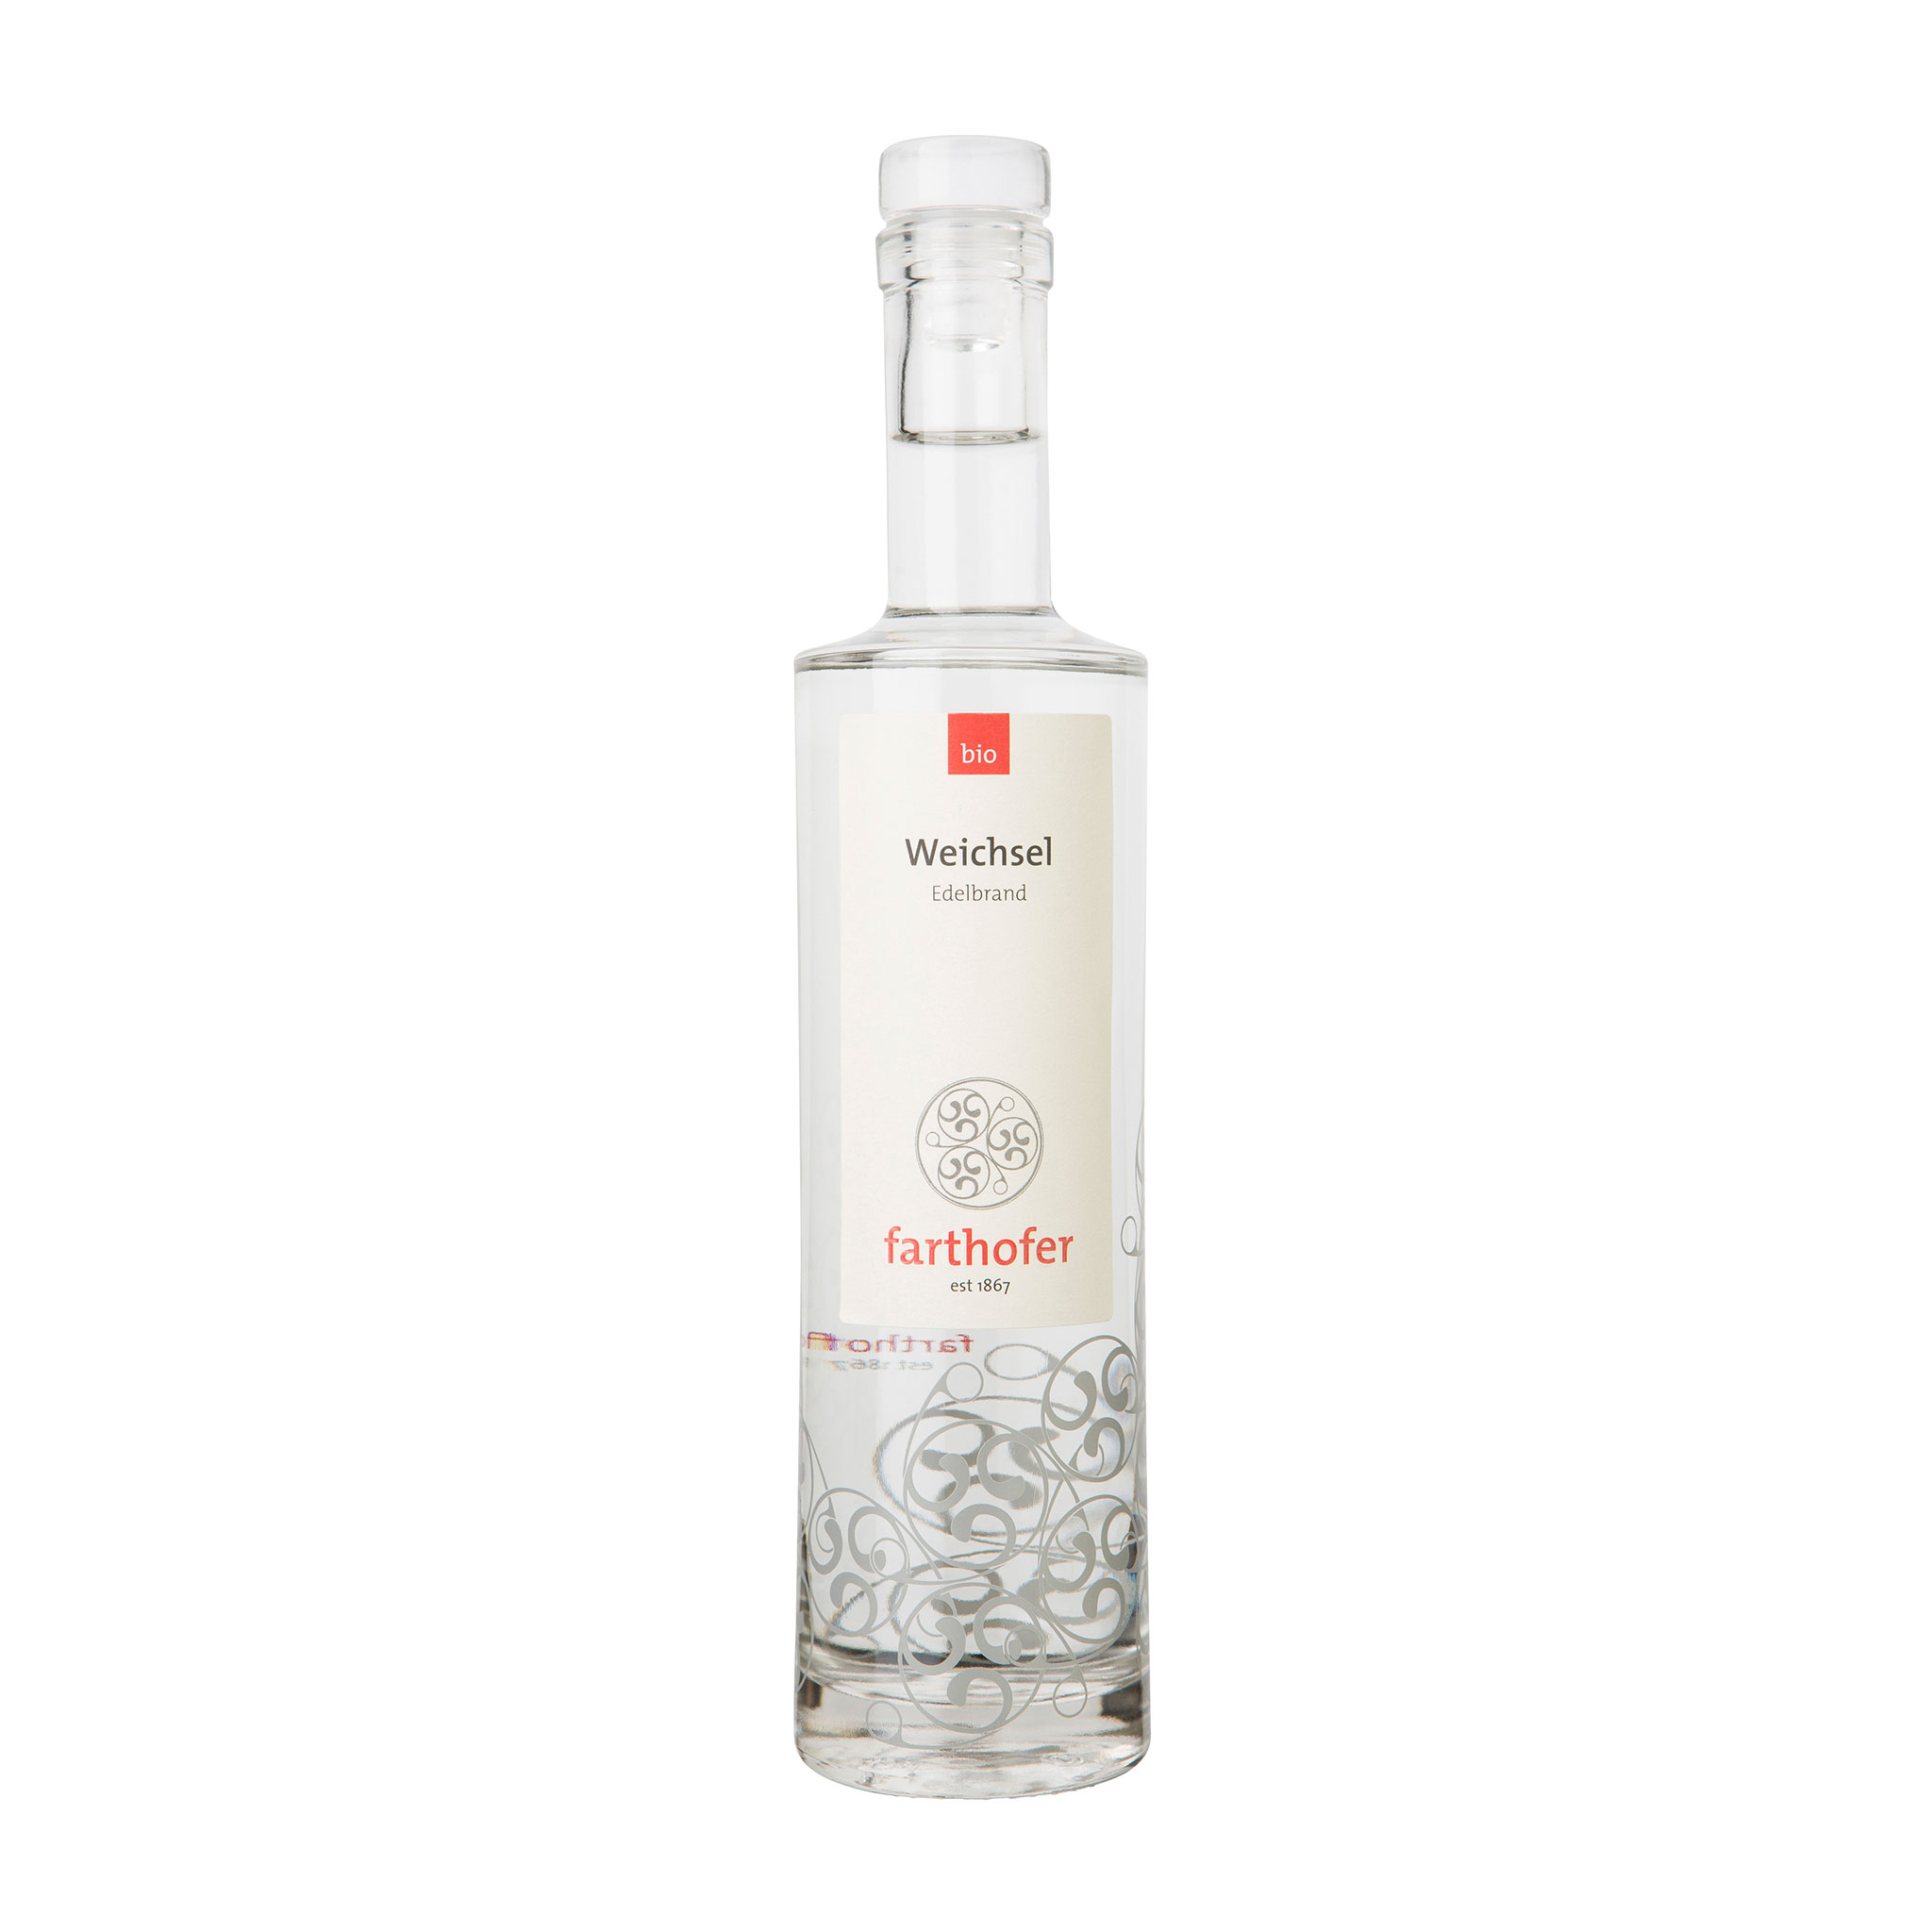 Weichselbrand (700 ml)